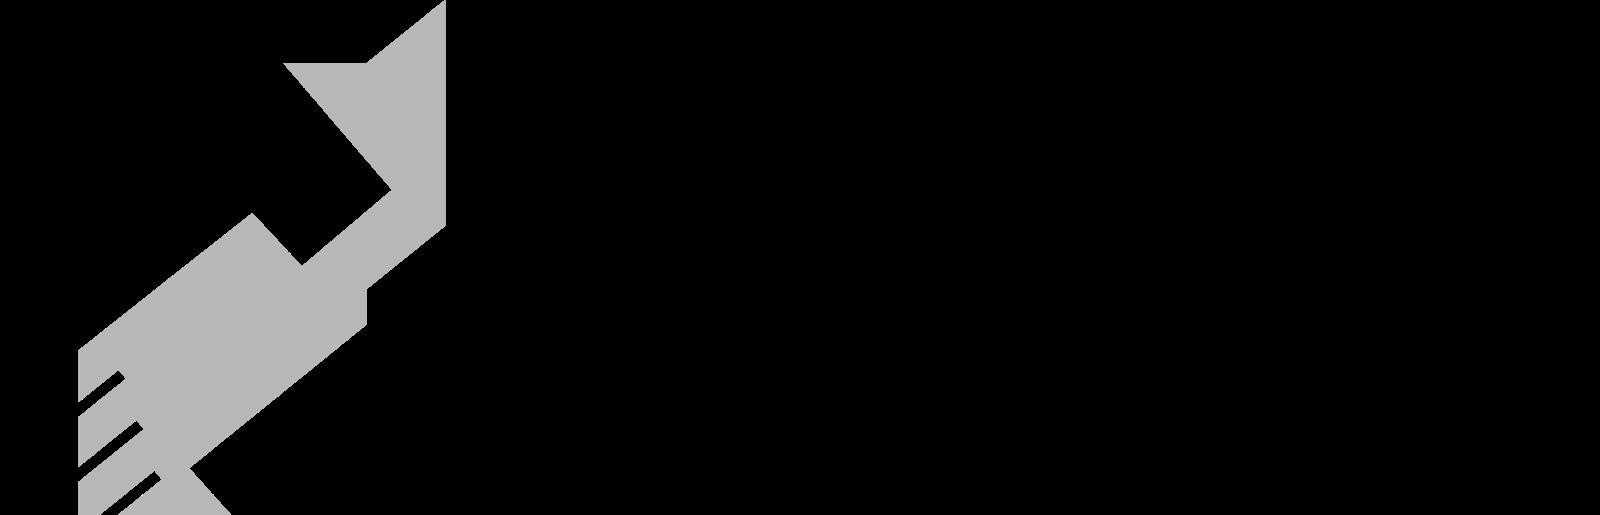 EcoMerge